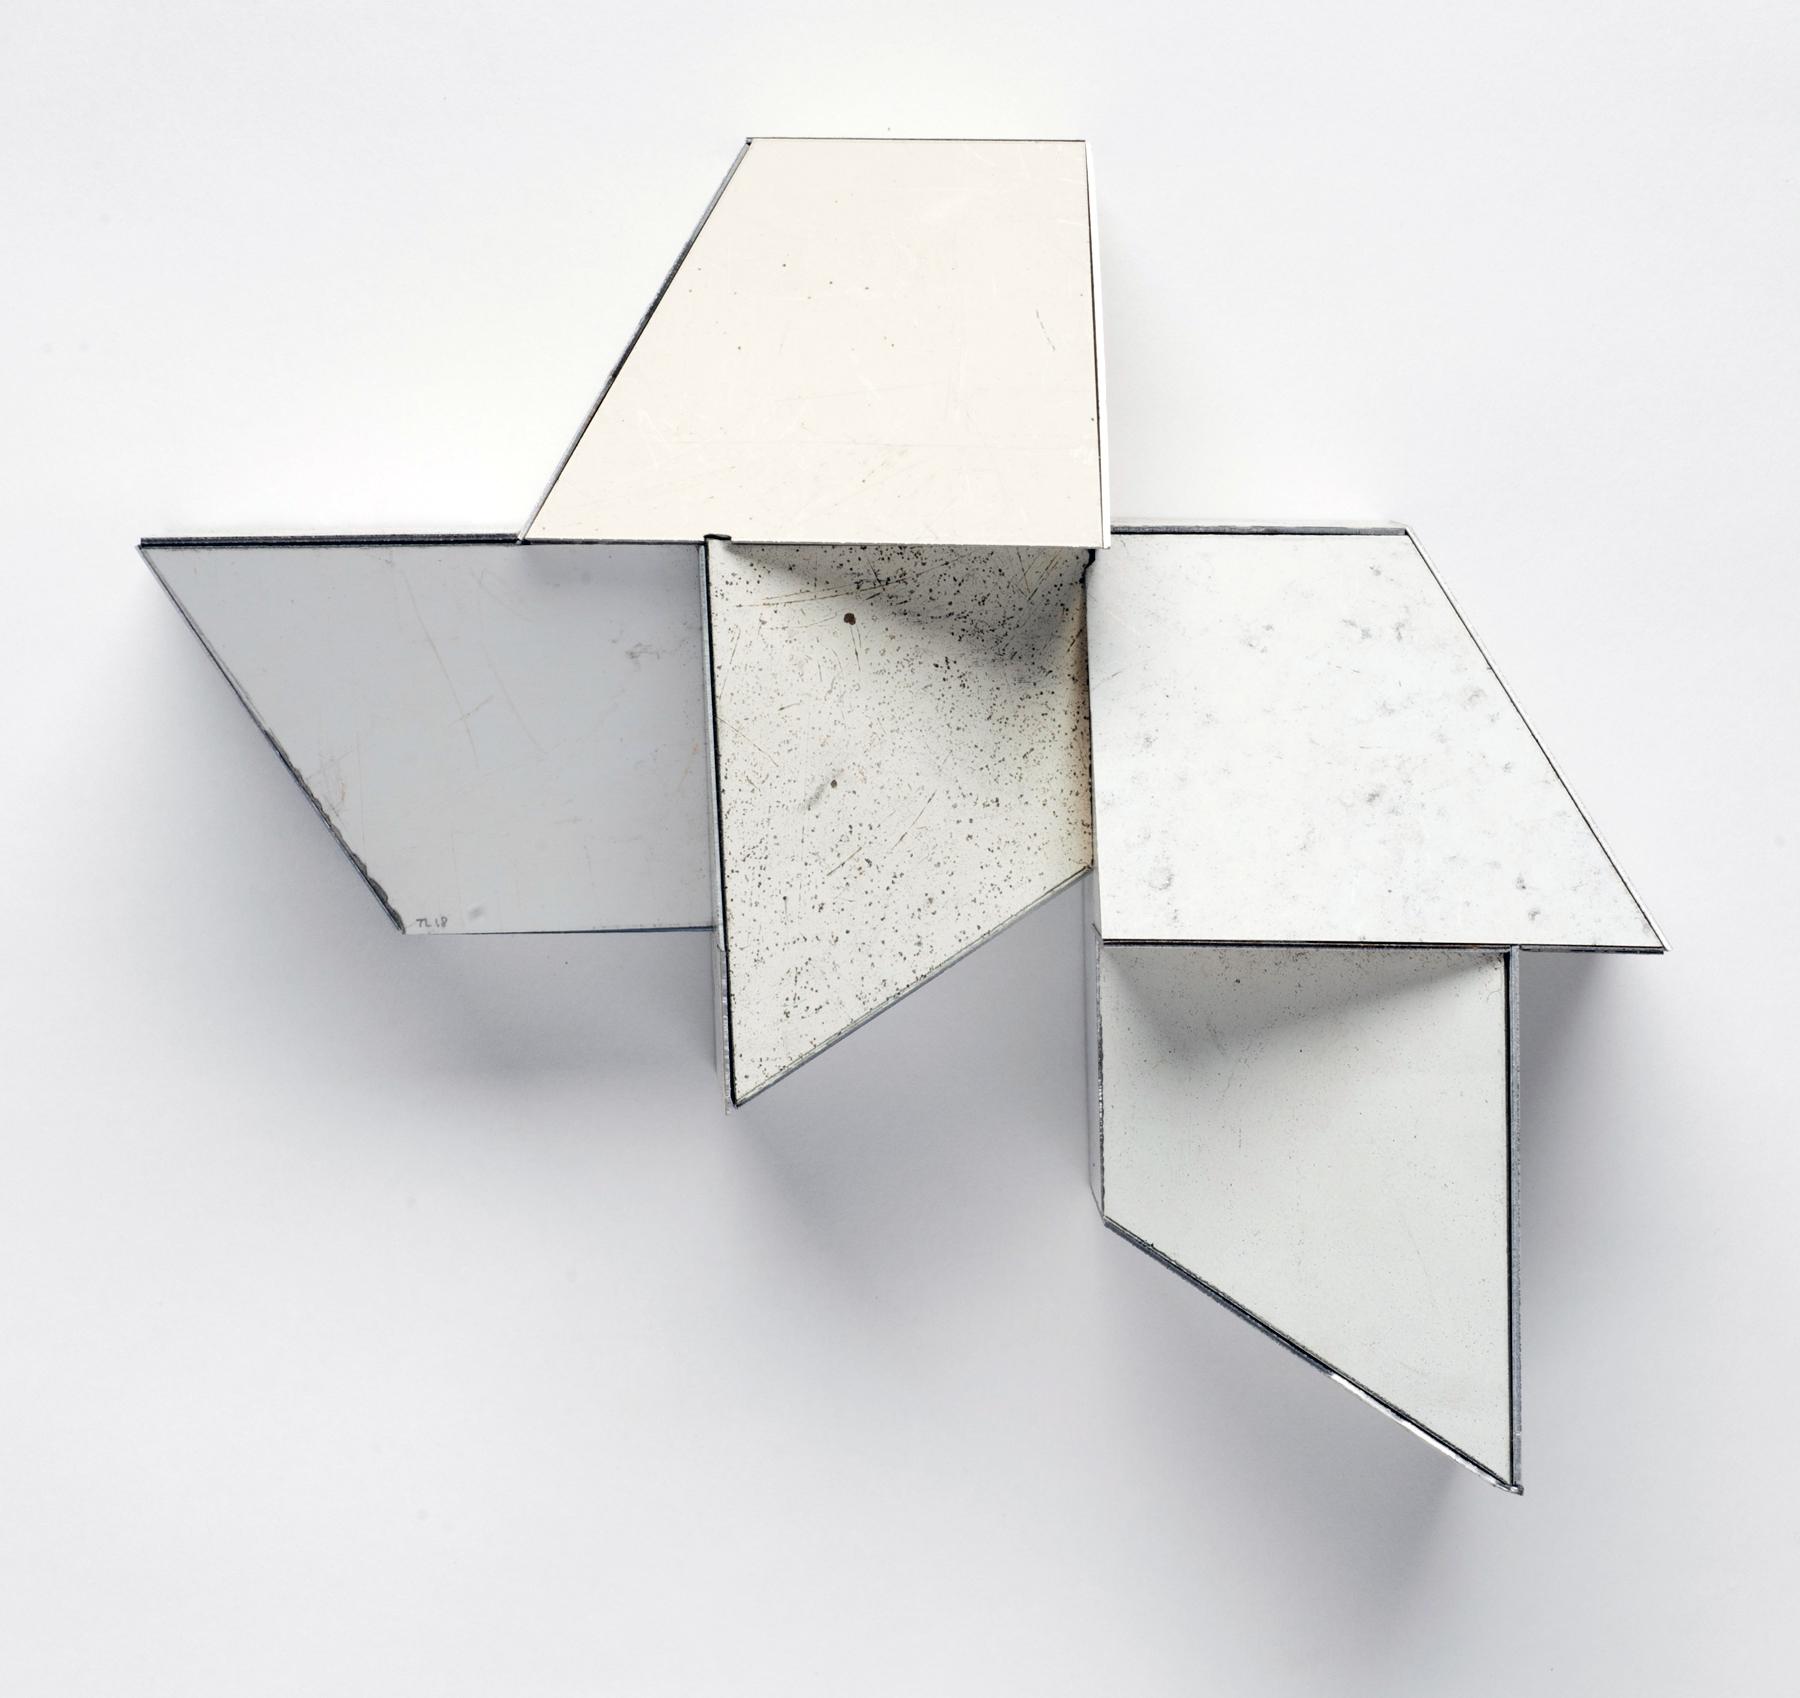 Random Pattern, 7.75 x 8.25 x 3.25 inches / 19.7 x 21 x 8.3 cm, salvage steel, marine-grade plywood, silicone, vulcanized rubber, hardware, 2018